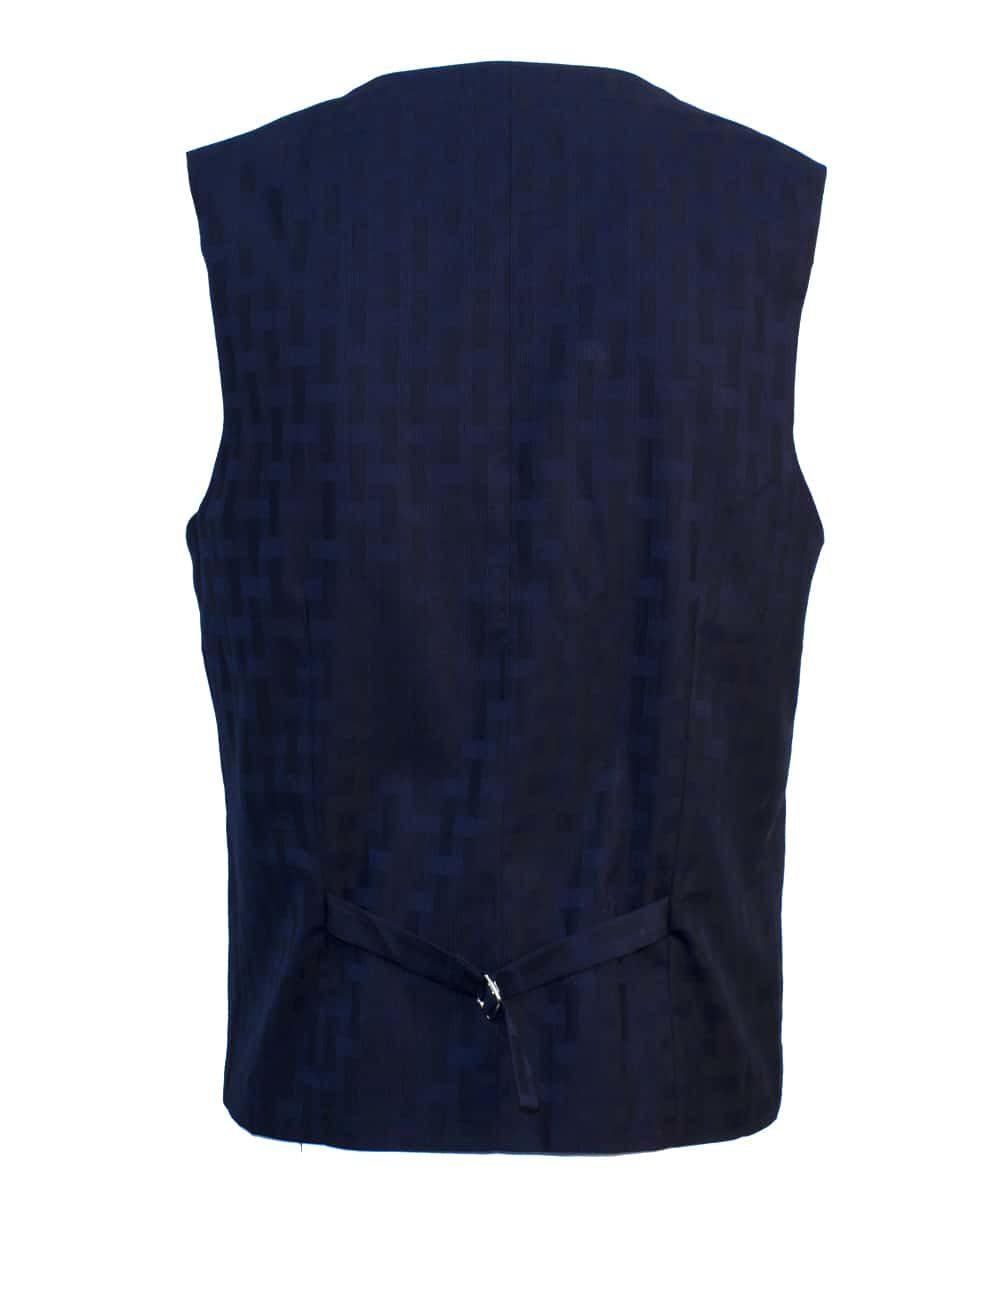 Tailored Fit Black Checks Double Breasted Vest V2V2.2